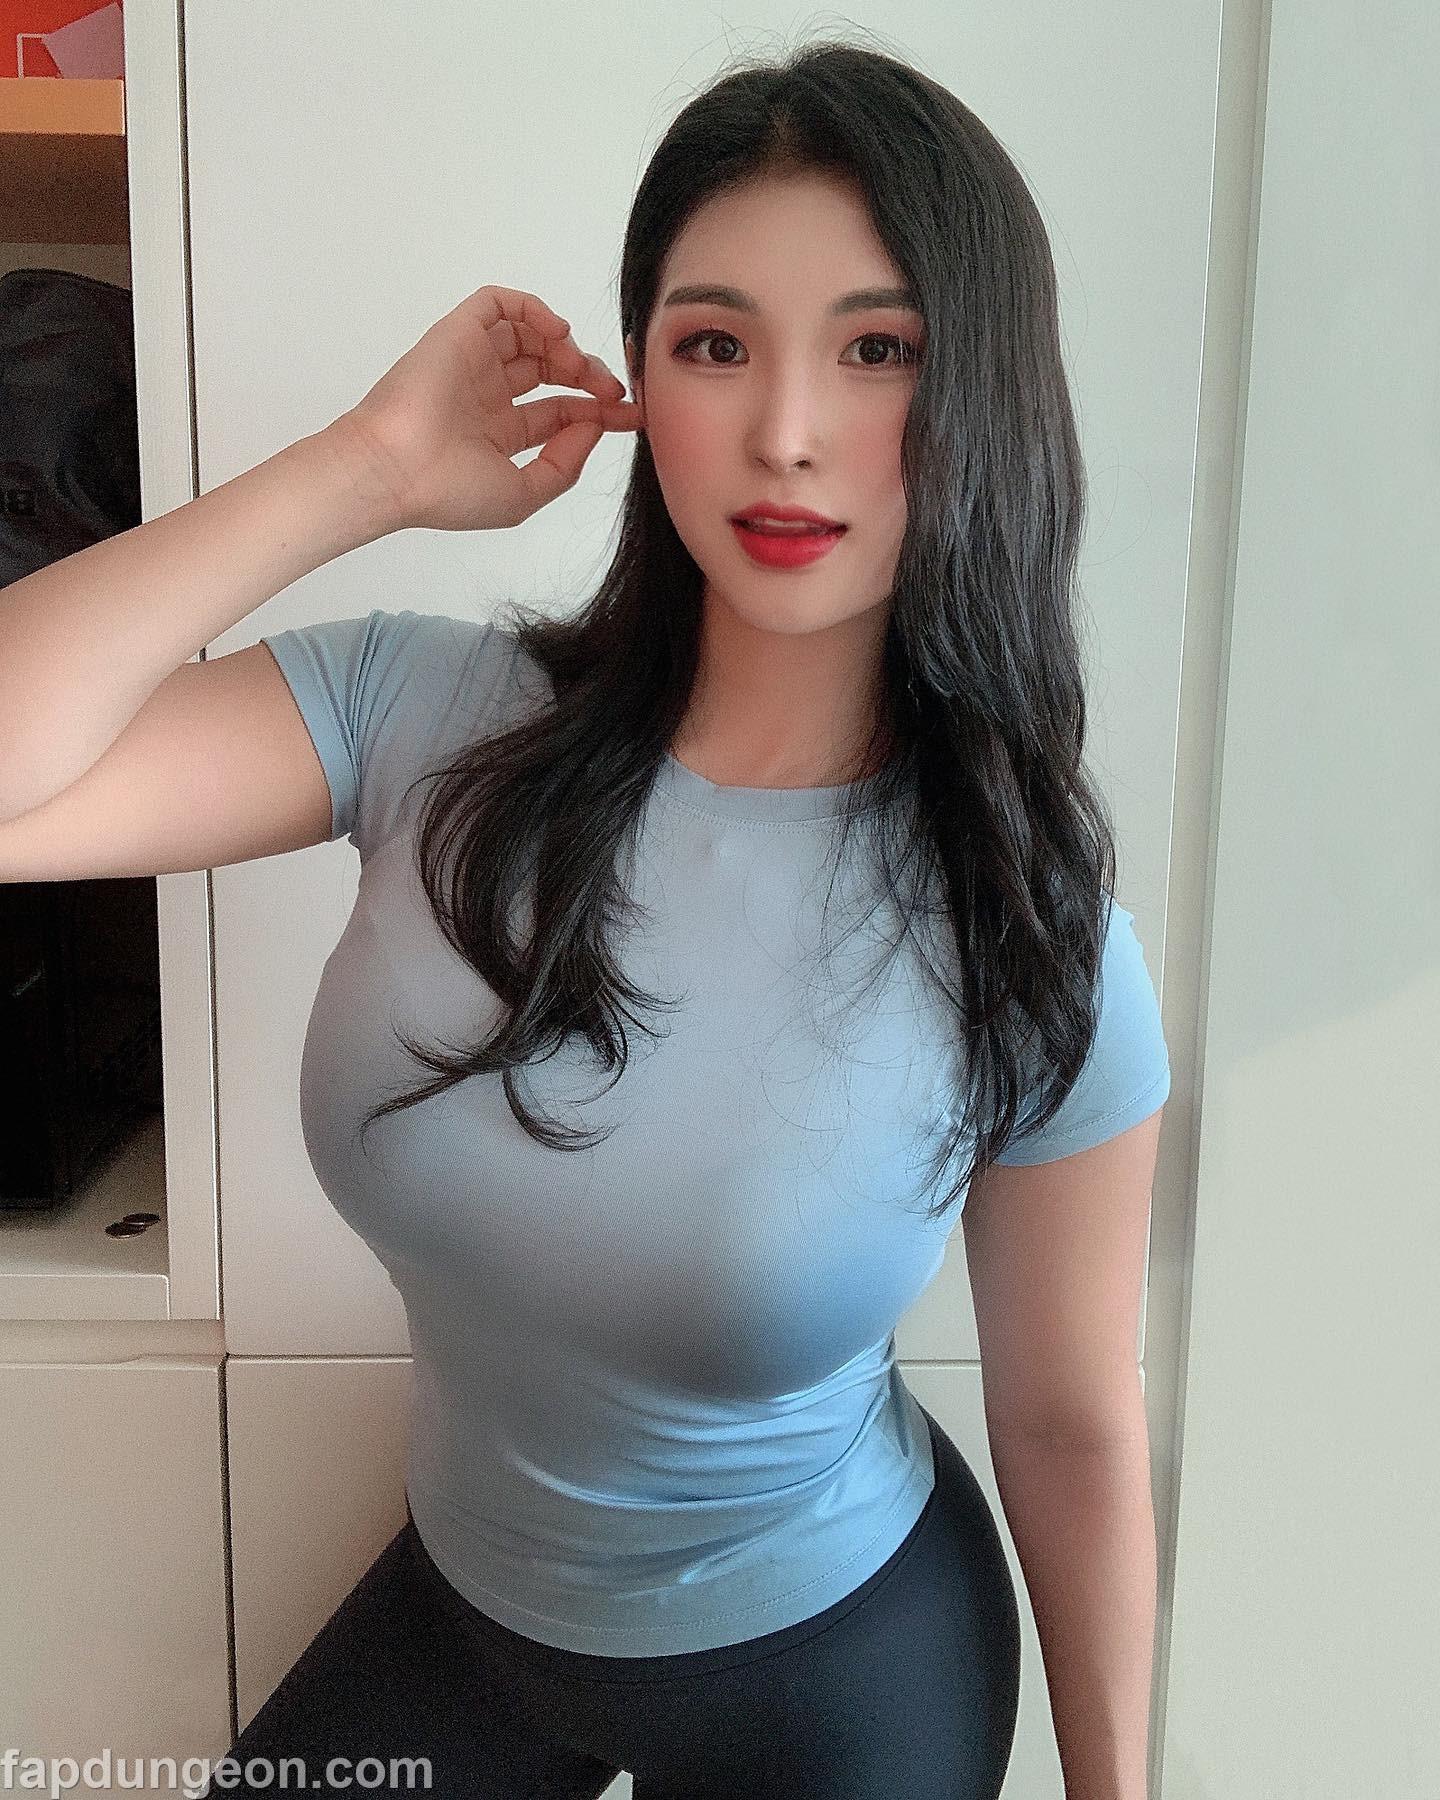 Daani._.e - Busty Big Booty Korean Model - Page 2 of 2